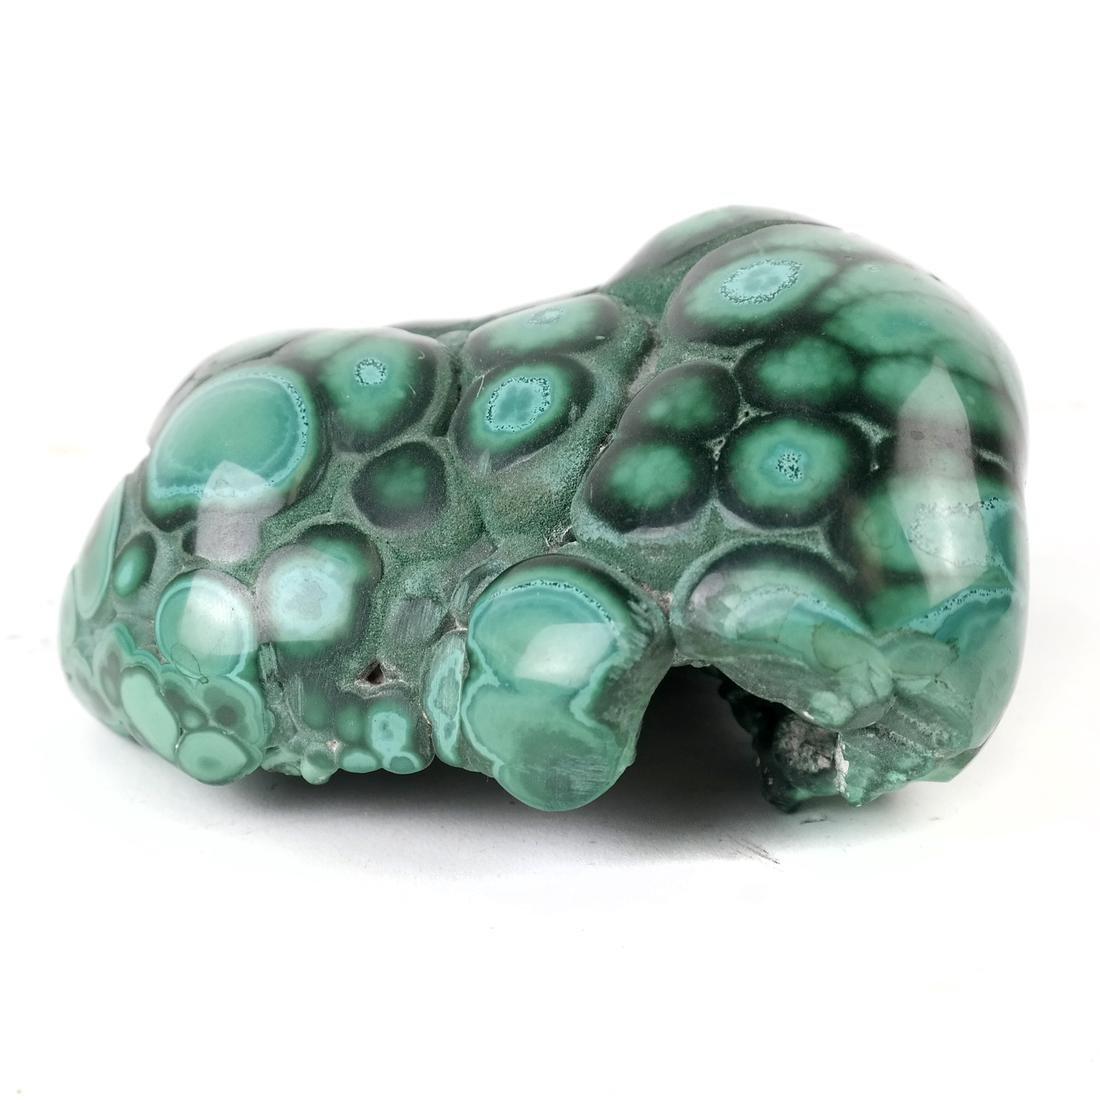 6 Pieces Polished Malachite - 5